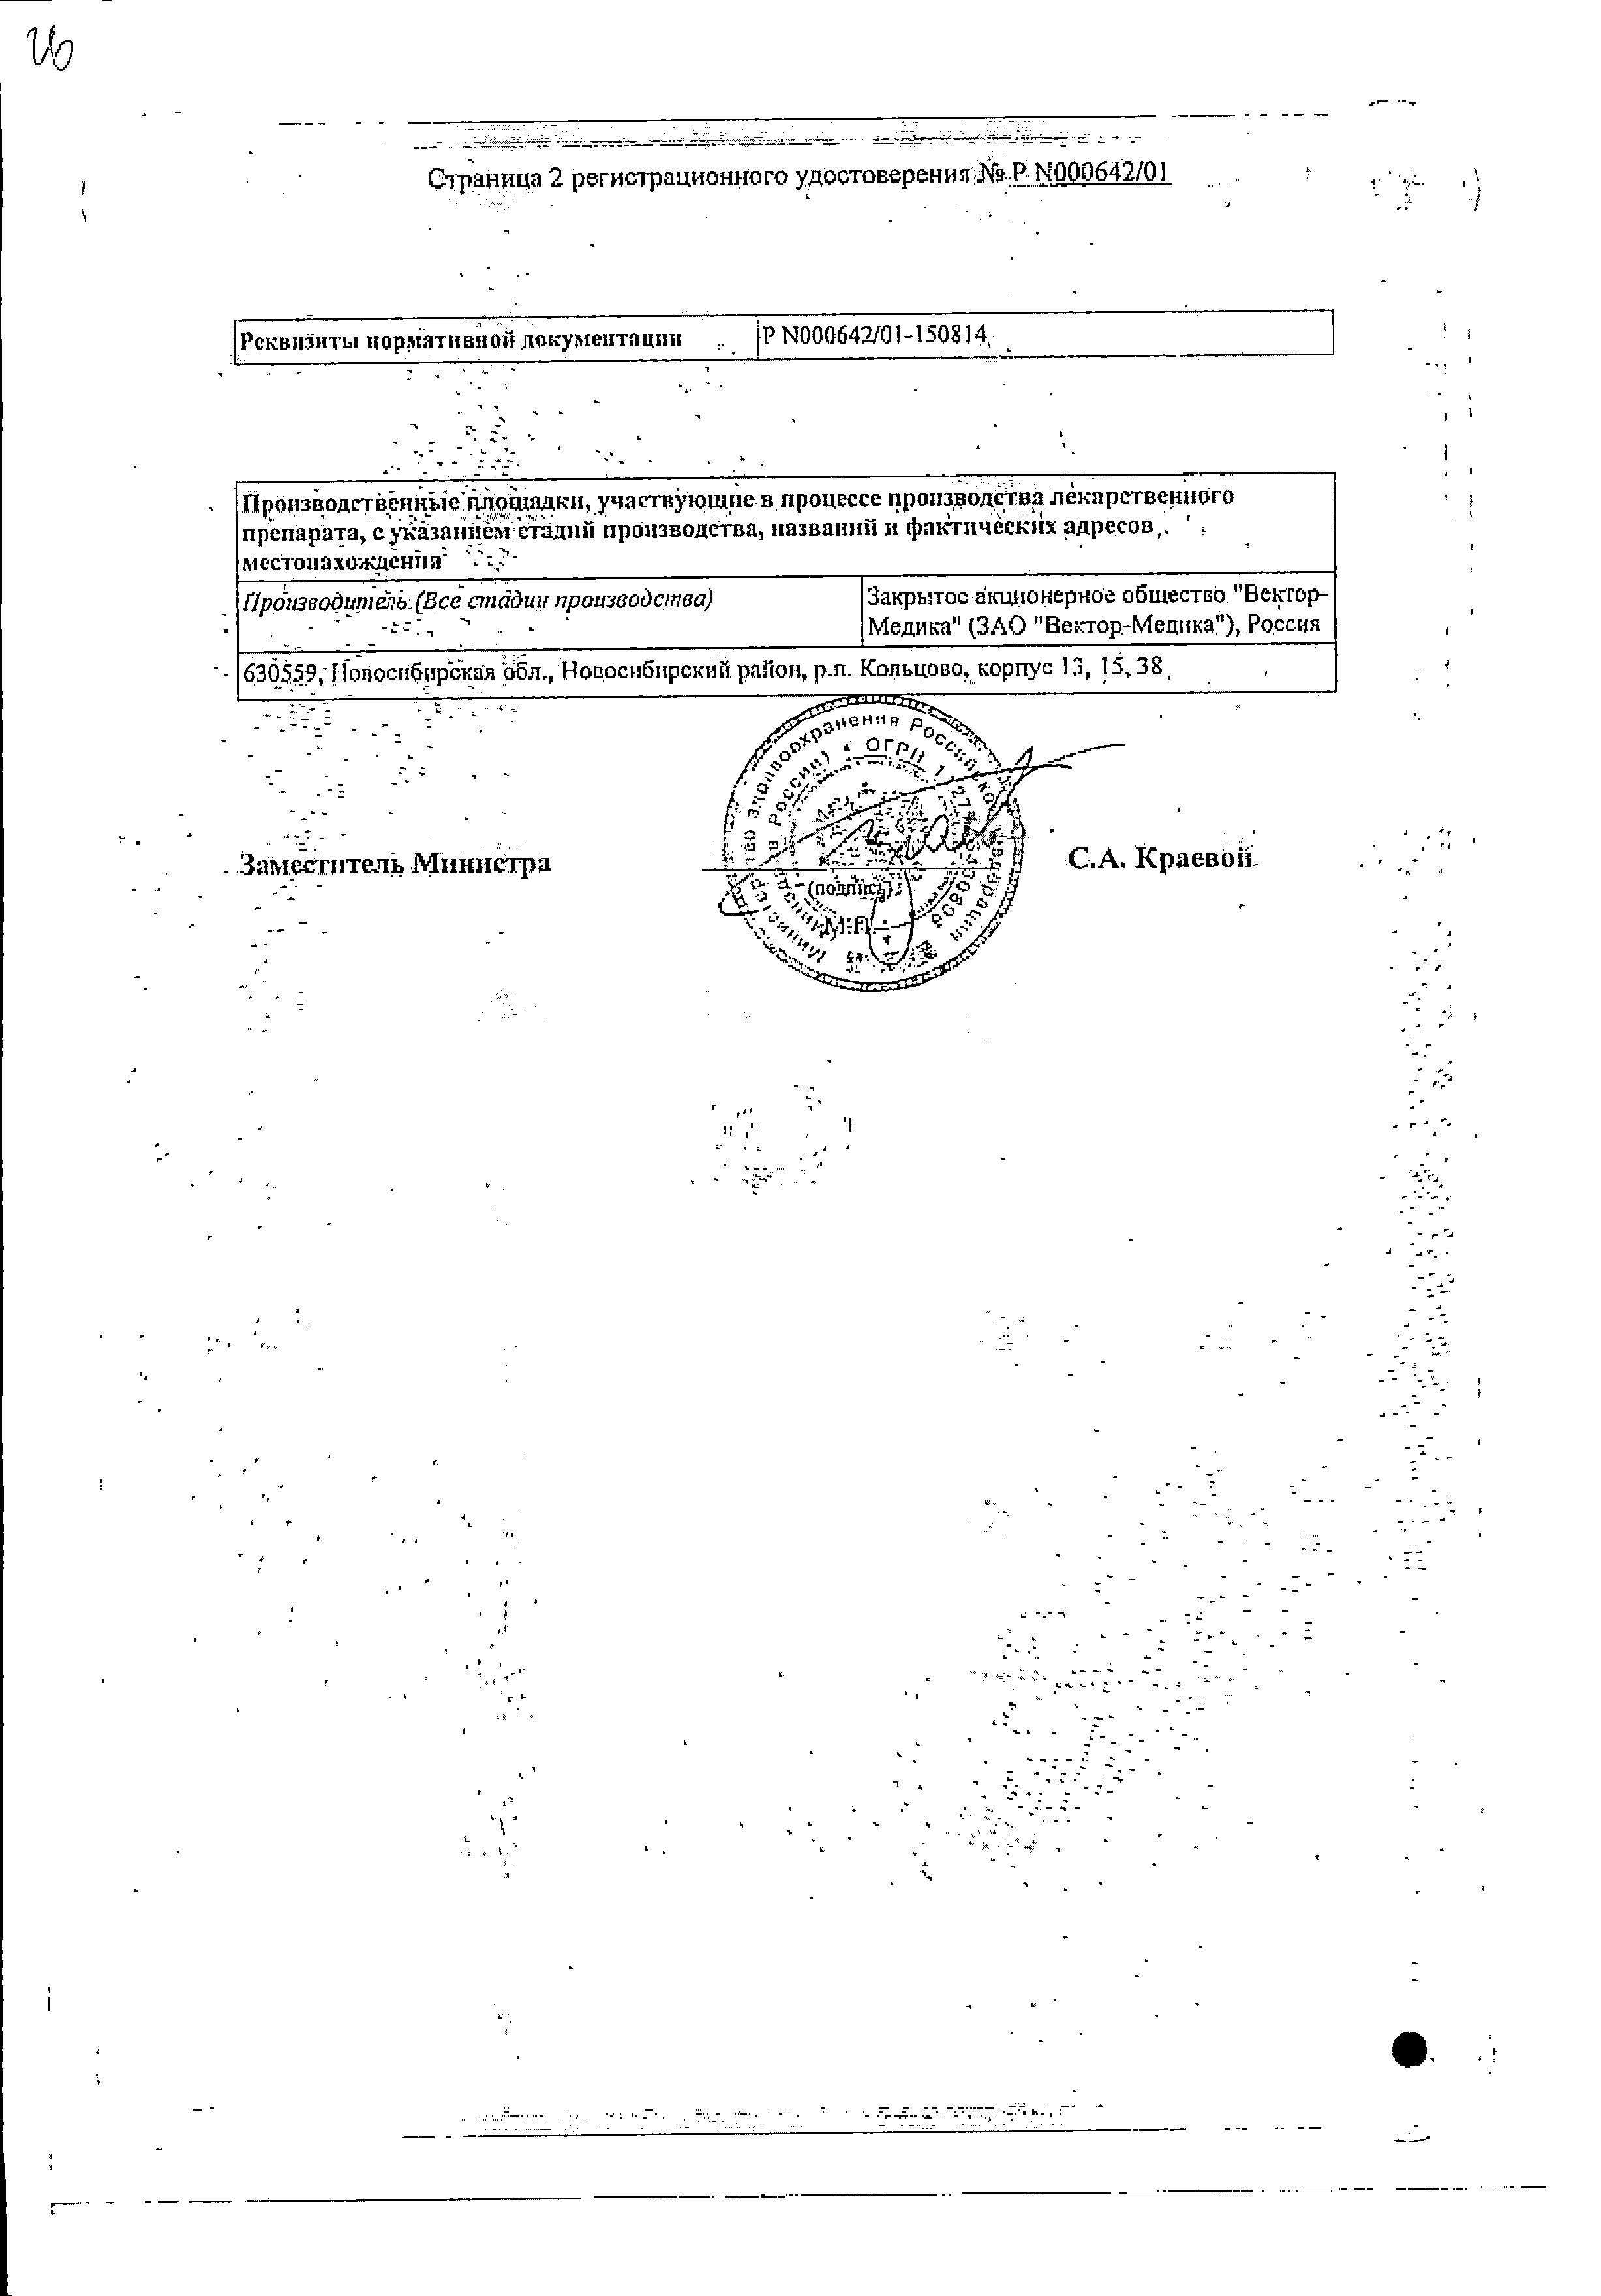 Реаферон-ЕС сертификат